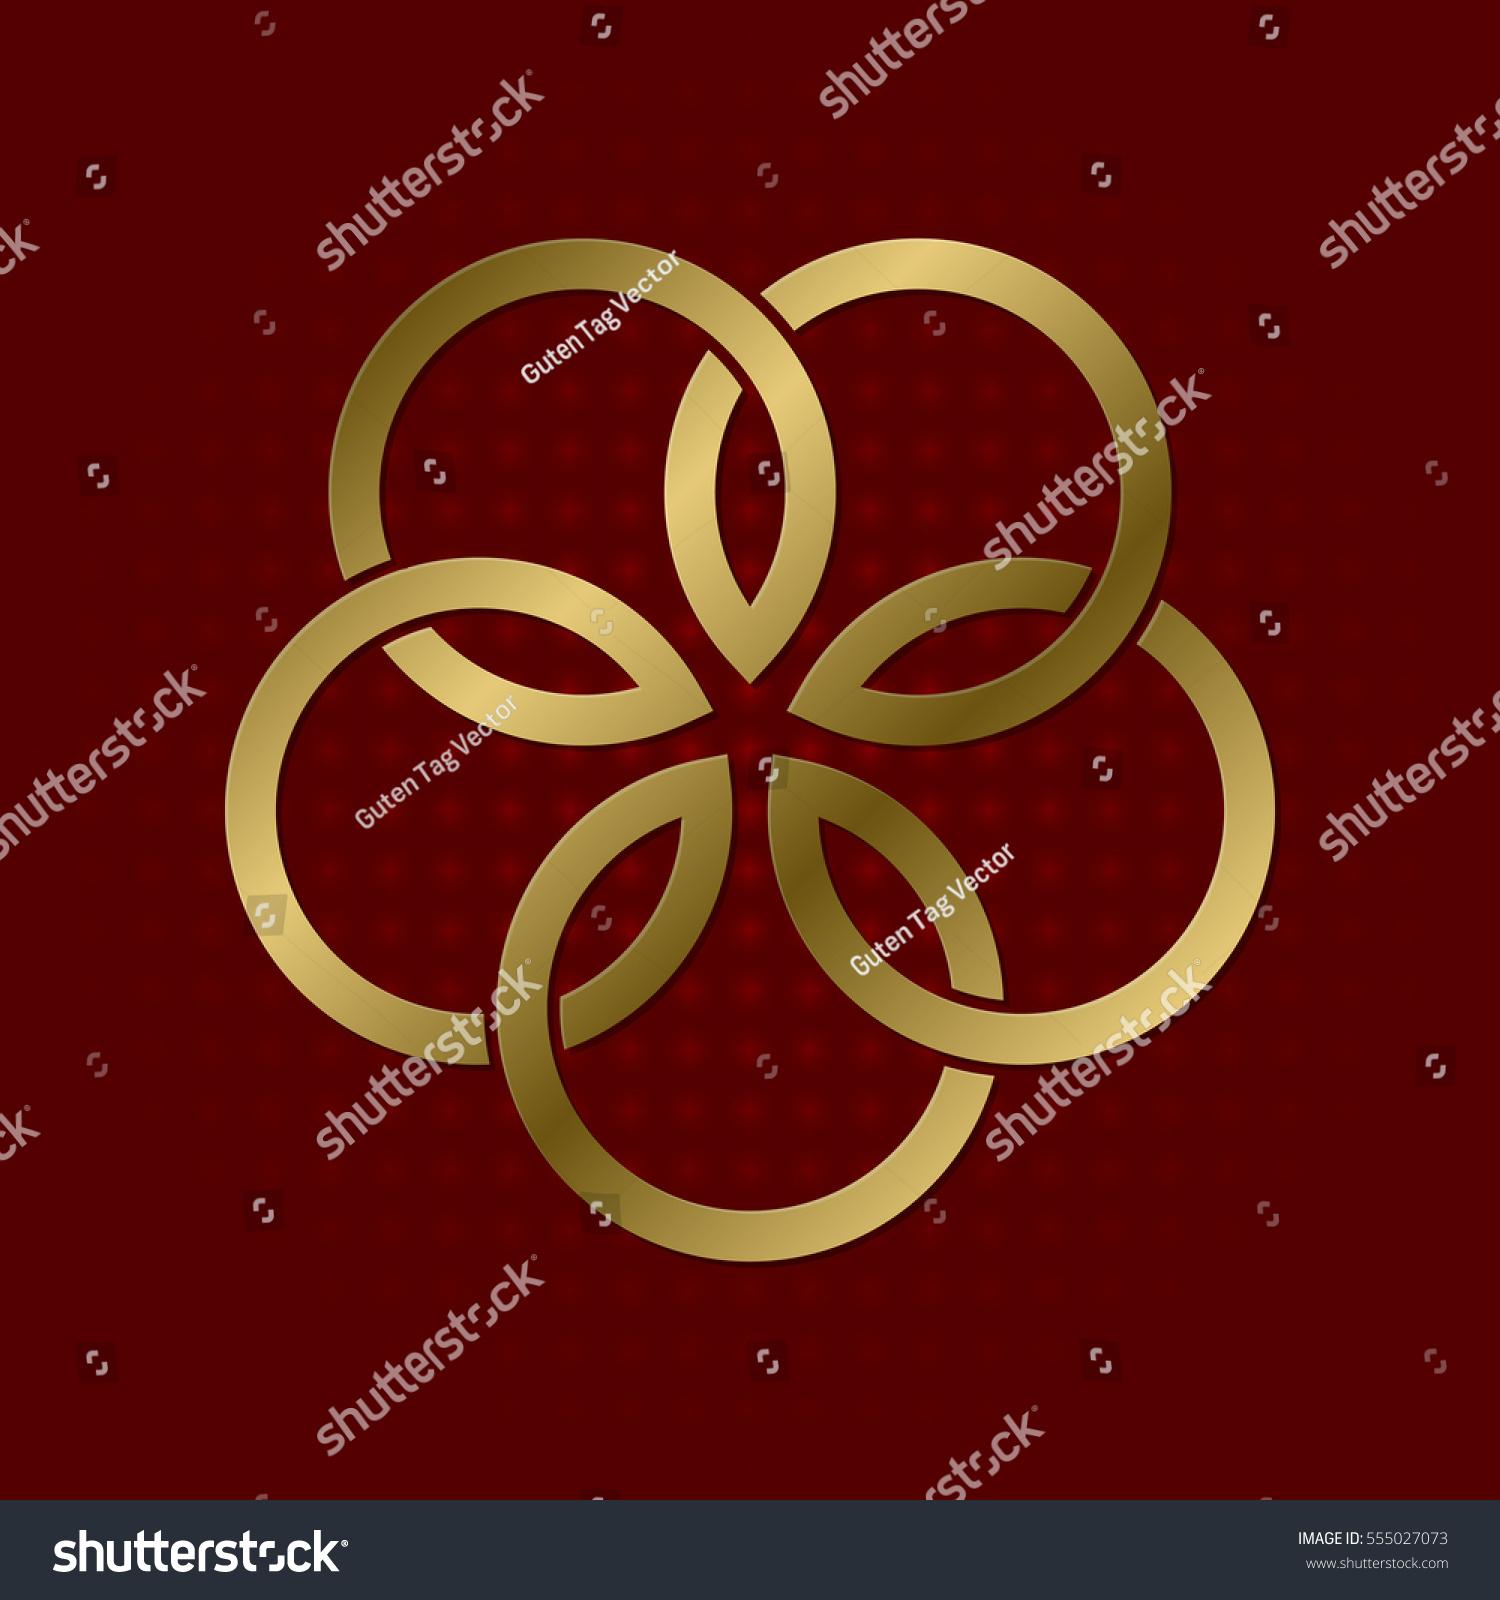 Symbol for five choice image symbol and sign ideas sacred geometric symbol five flower petals stock vector 555027073 sacred geometric symbol of five flower petals biocorpaavc